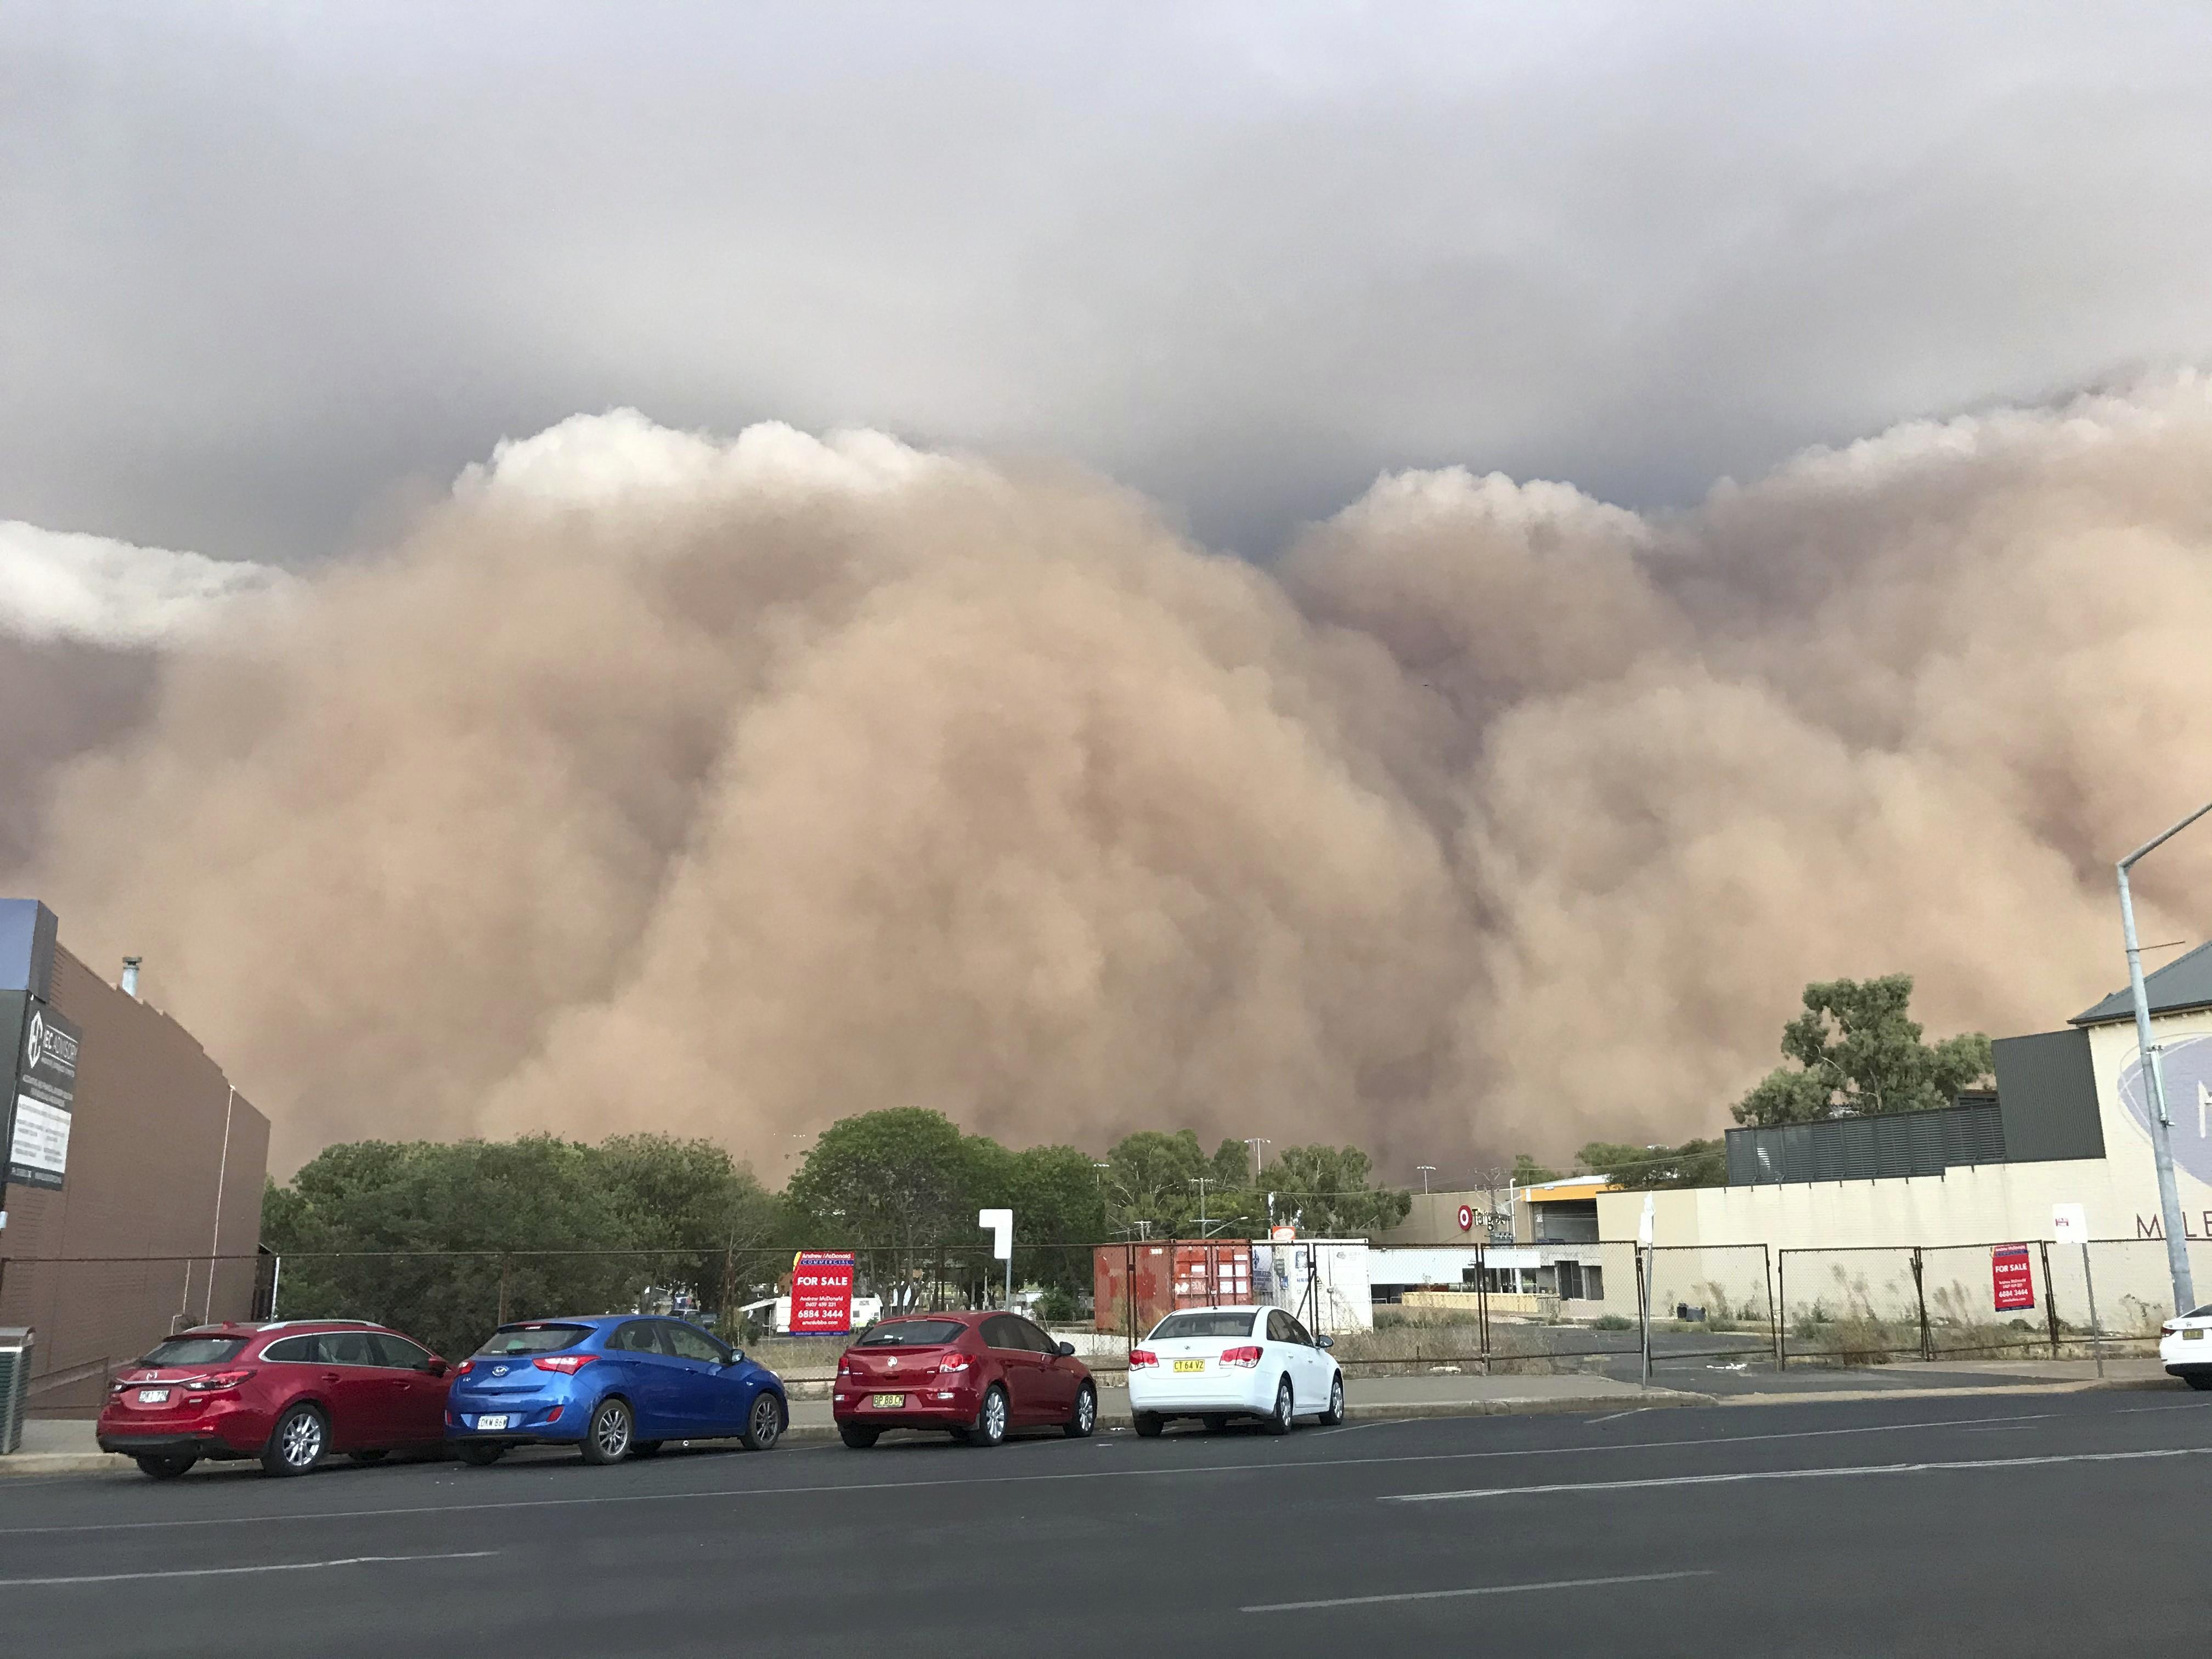 Sudeste da Austrália é atingido por tempestades de poeira; veja VÍDEO thumbnail